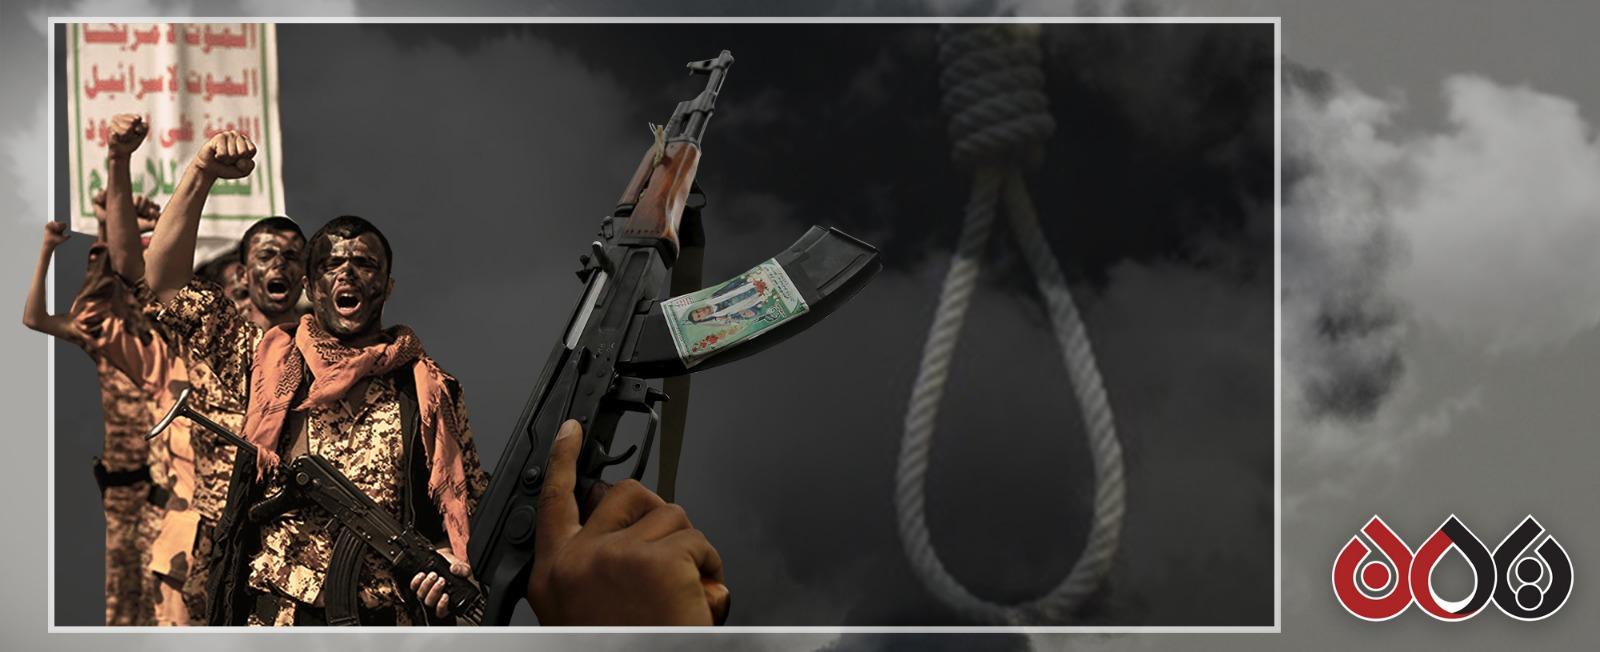 Photo of لماذا يهاجم الحوثيون الرياض الآن؟.. مركز دراسات أمريكي يجيب